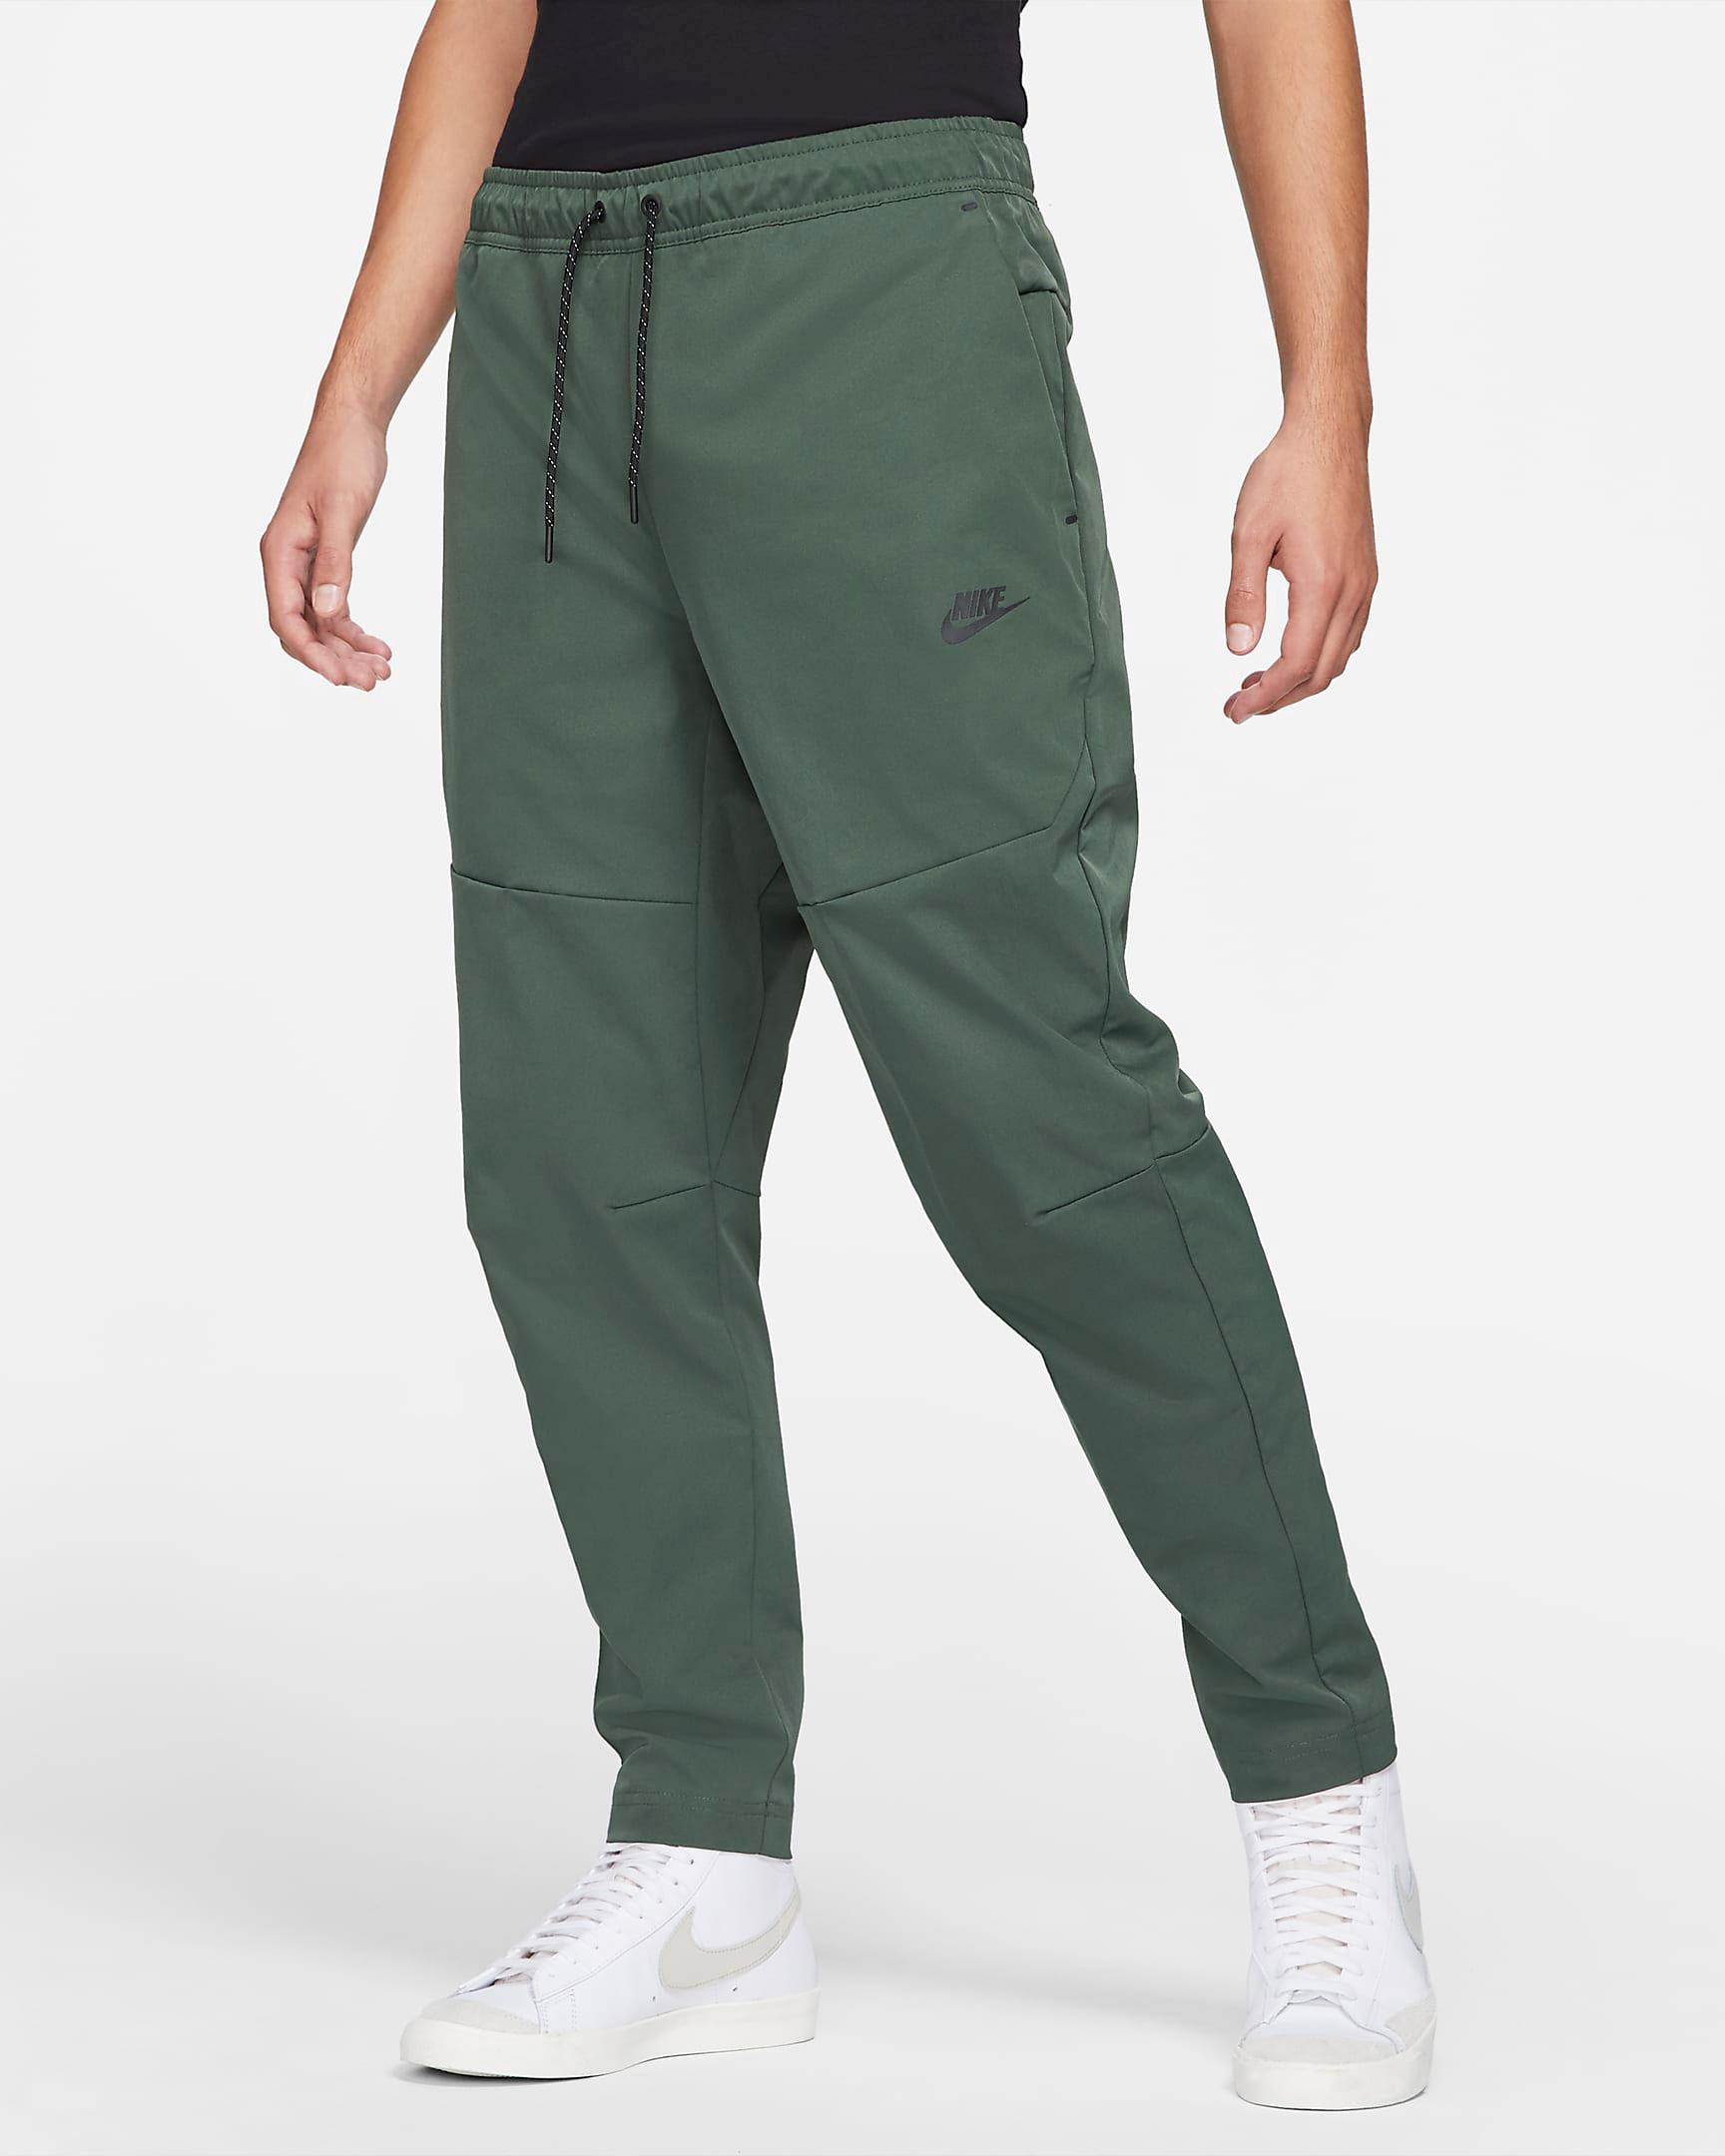 nike-galactic-jade-woven-pants-1